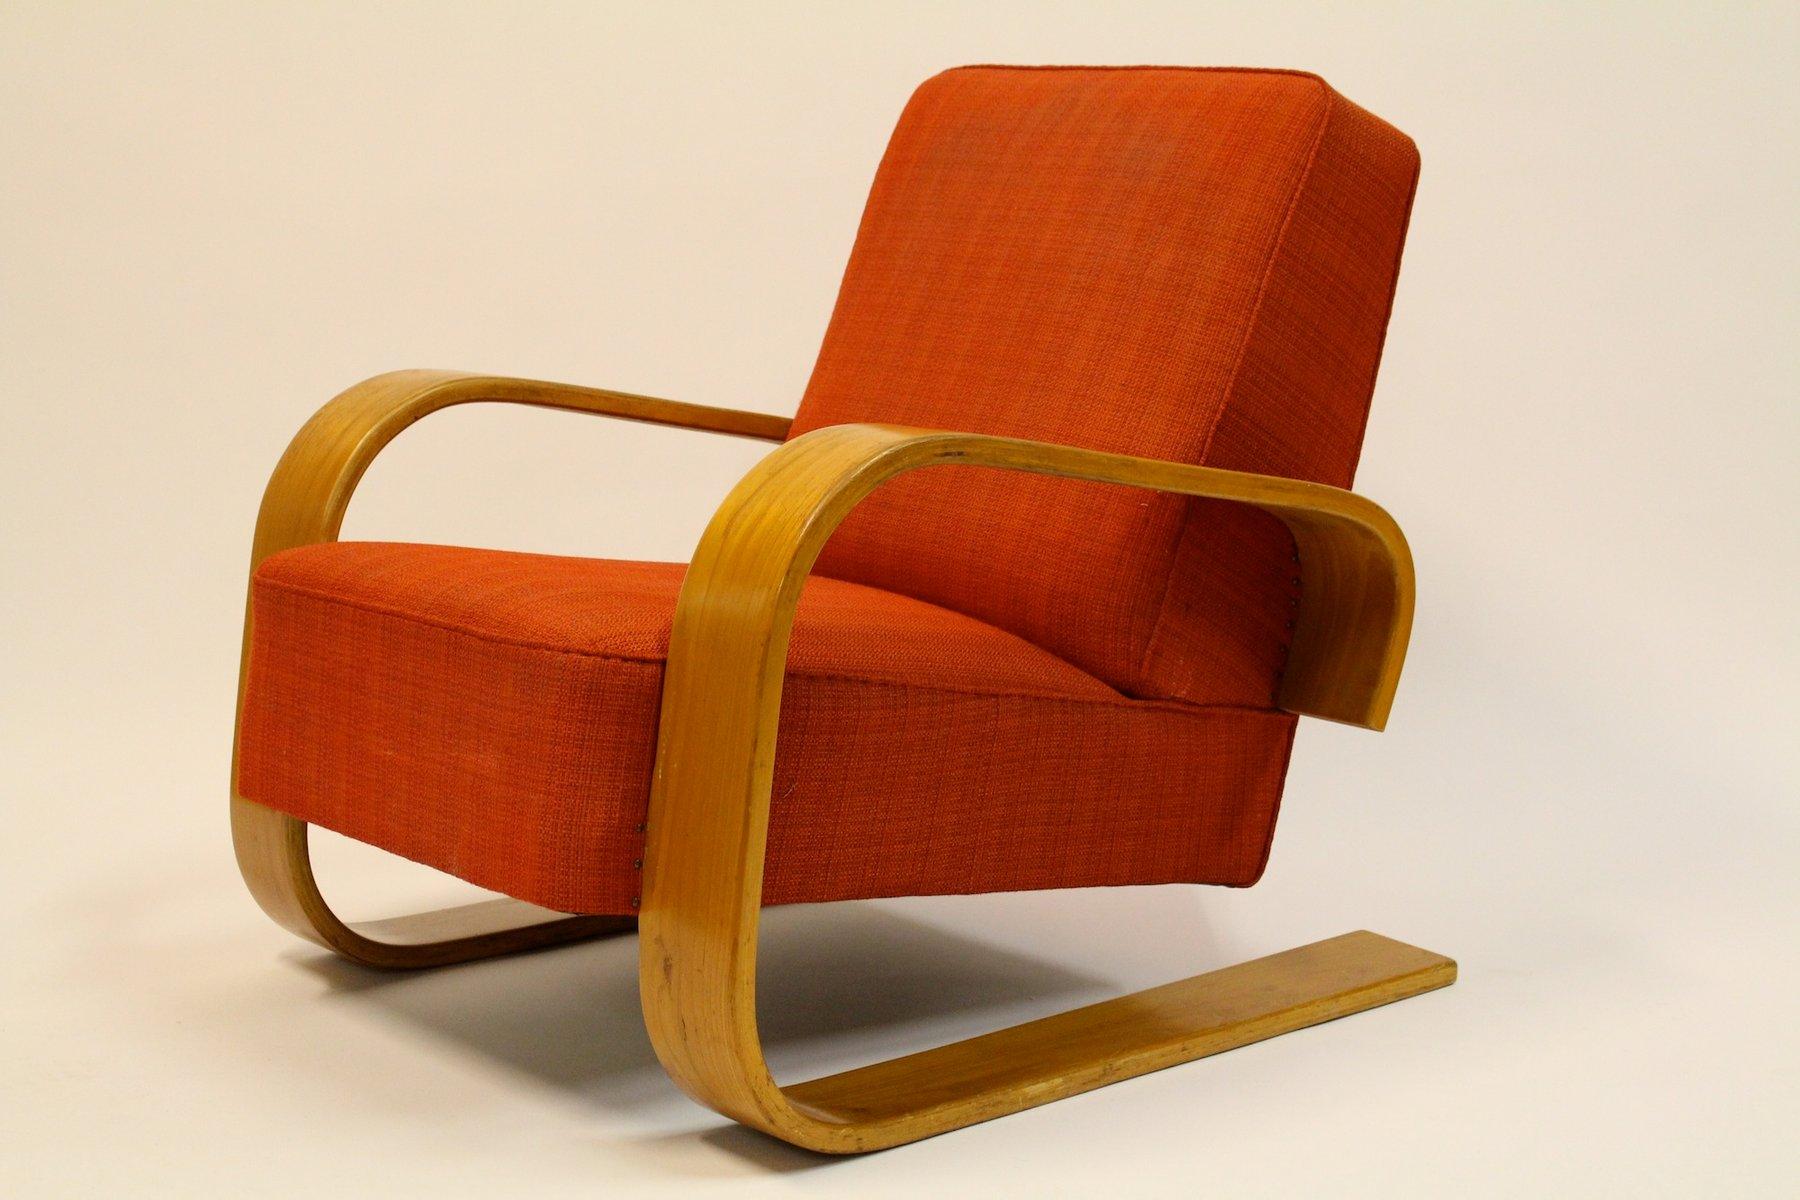 Alvar Aalto Chaise Gallery Of Alvar Aalto Chair With